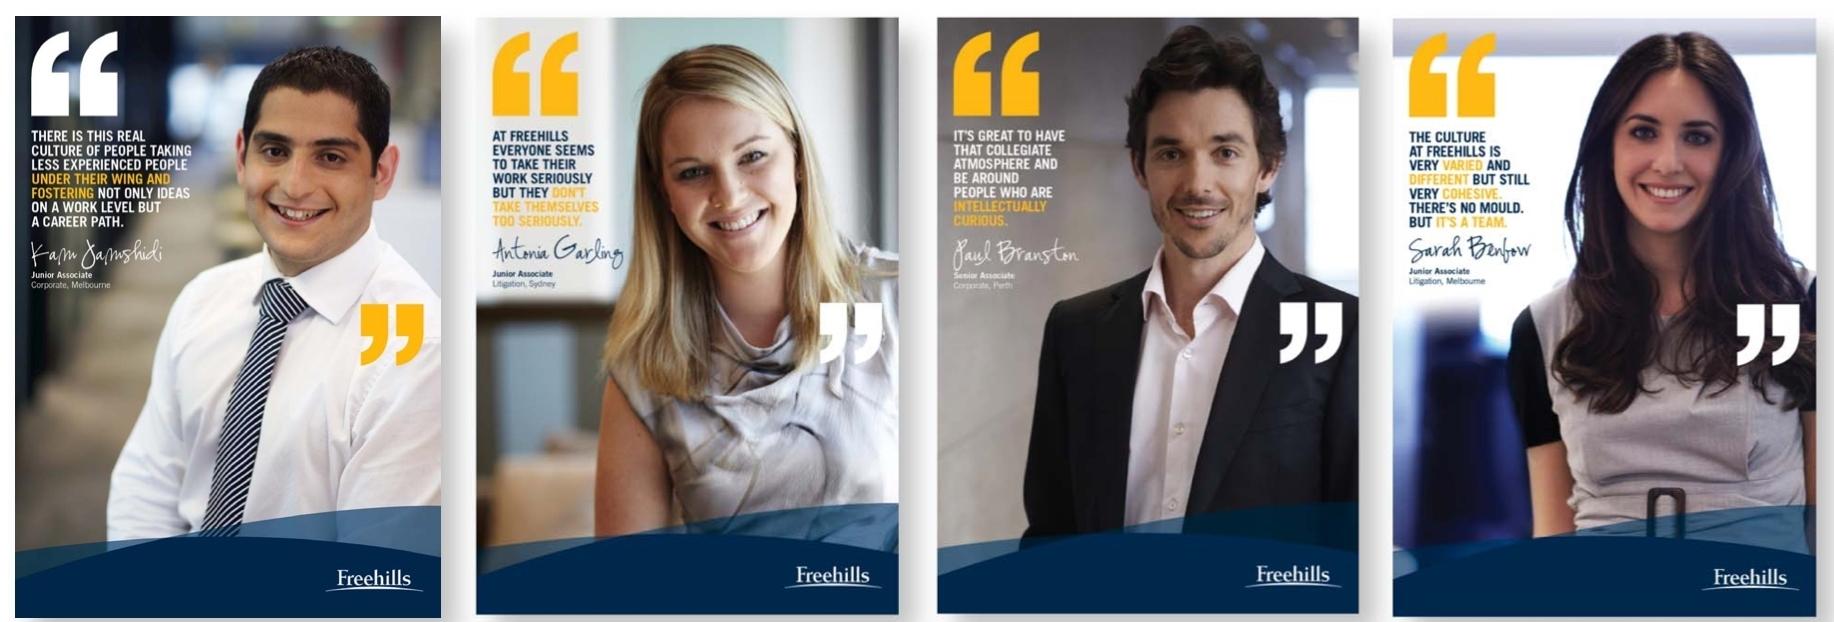 Freehills – Graduate recruitment campaign